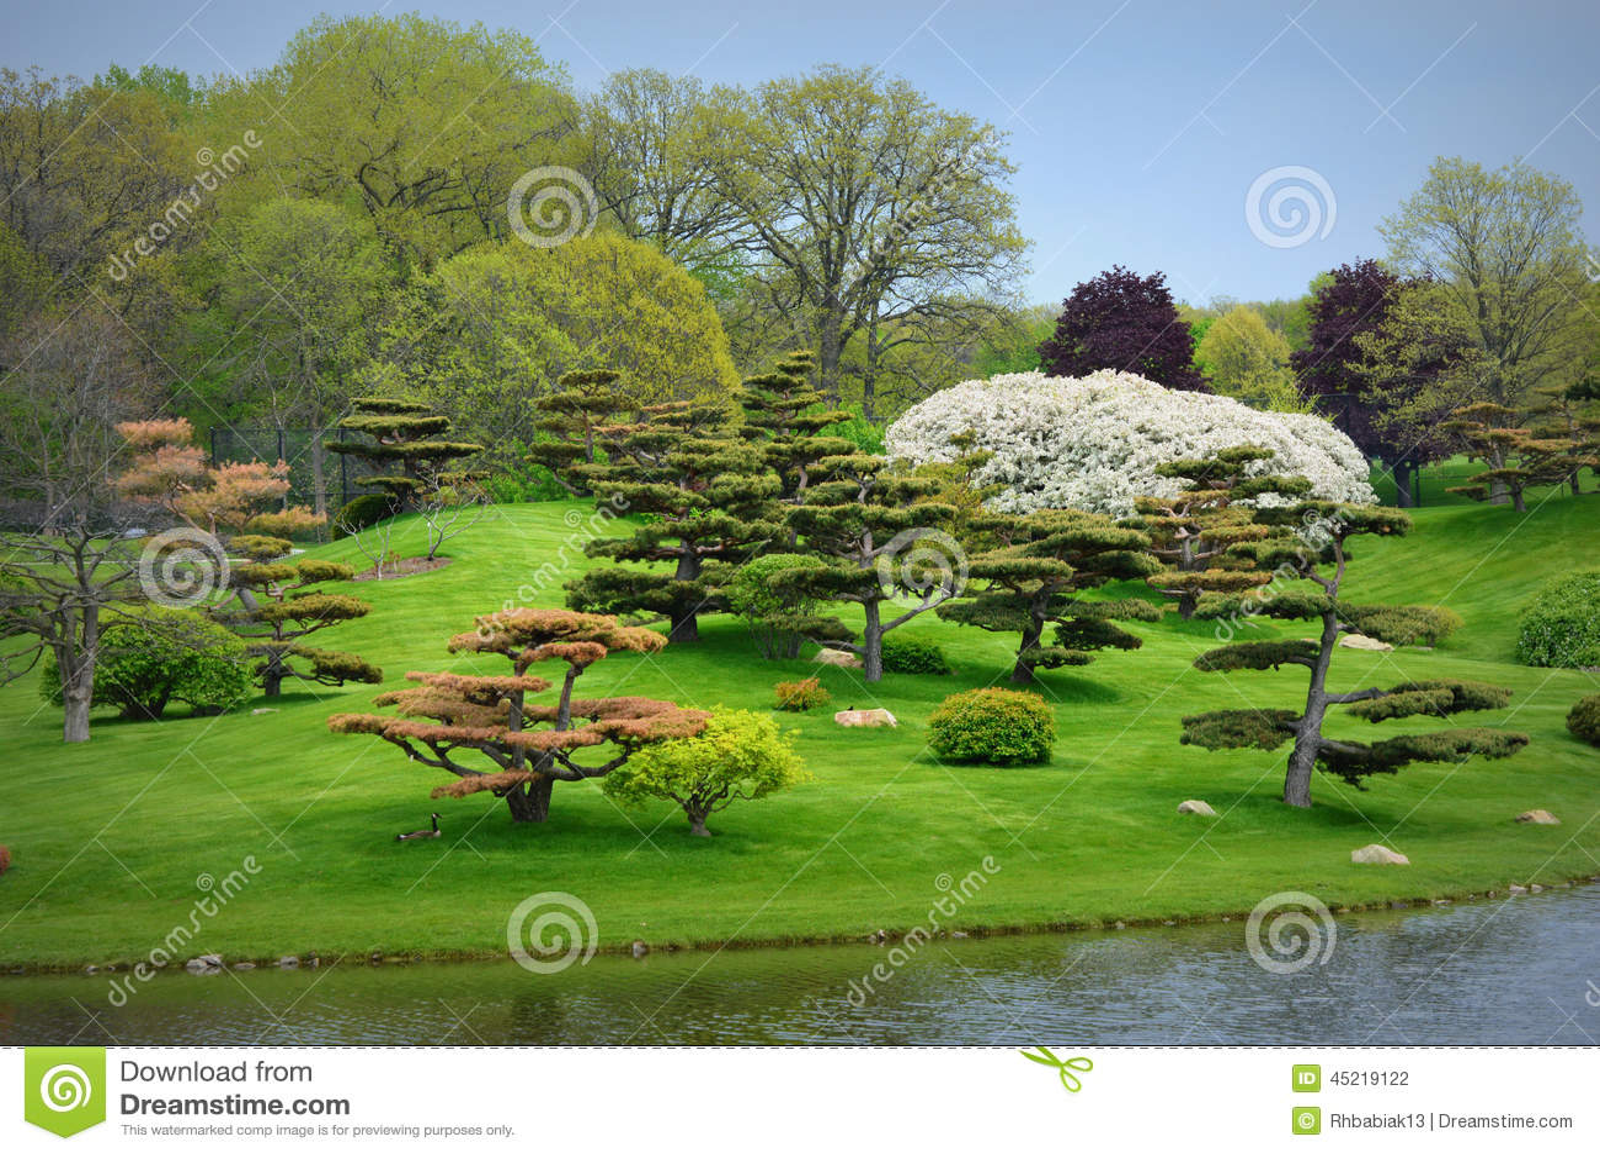 Japanese Garden Stock Photo Image 45219122